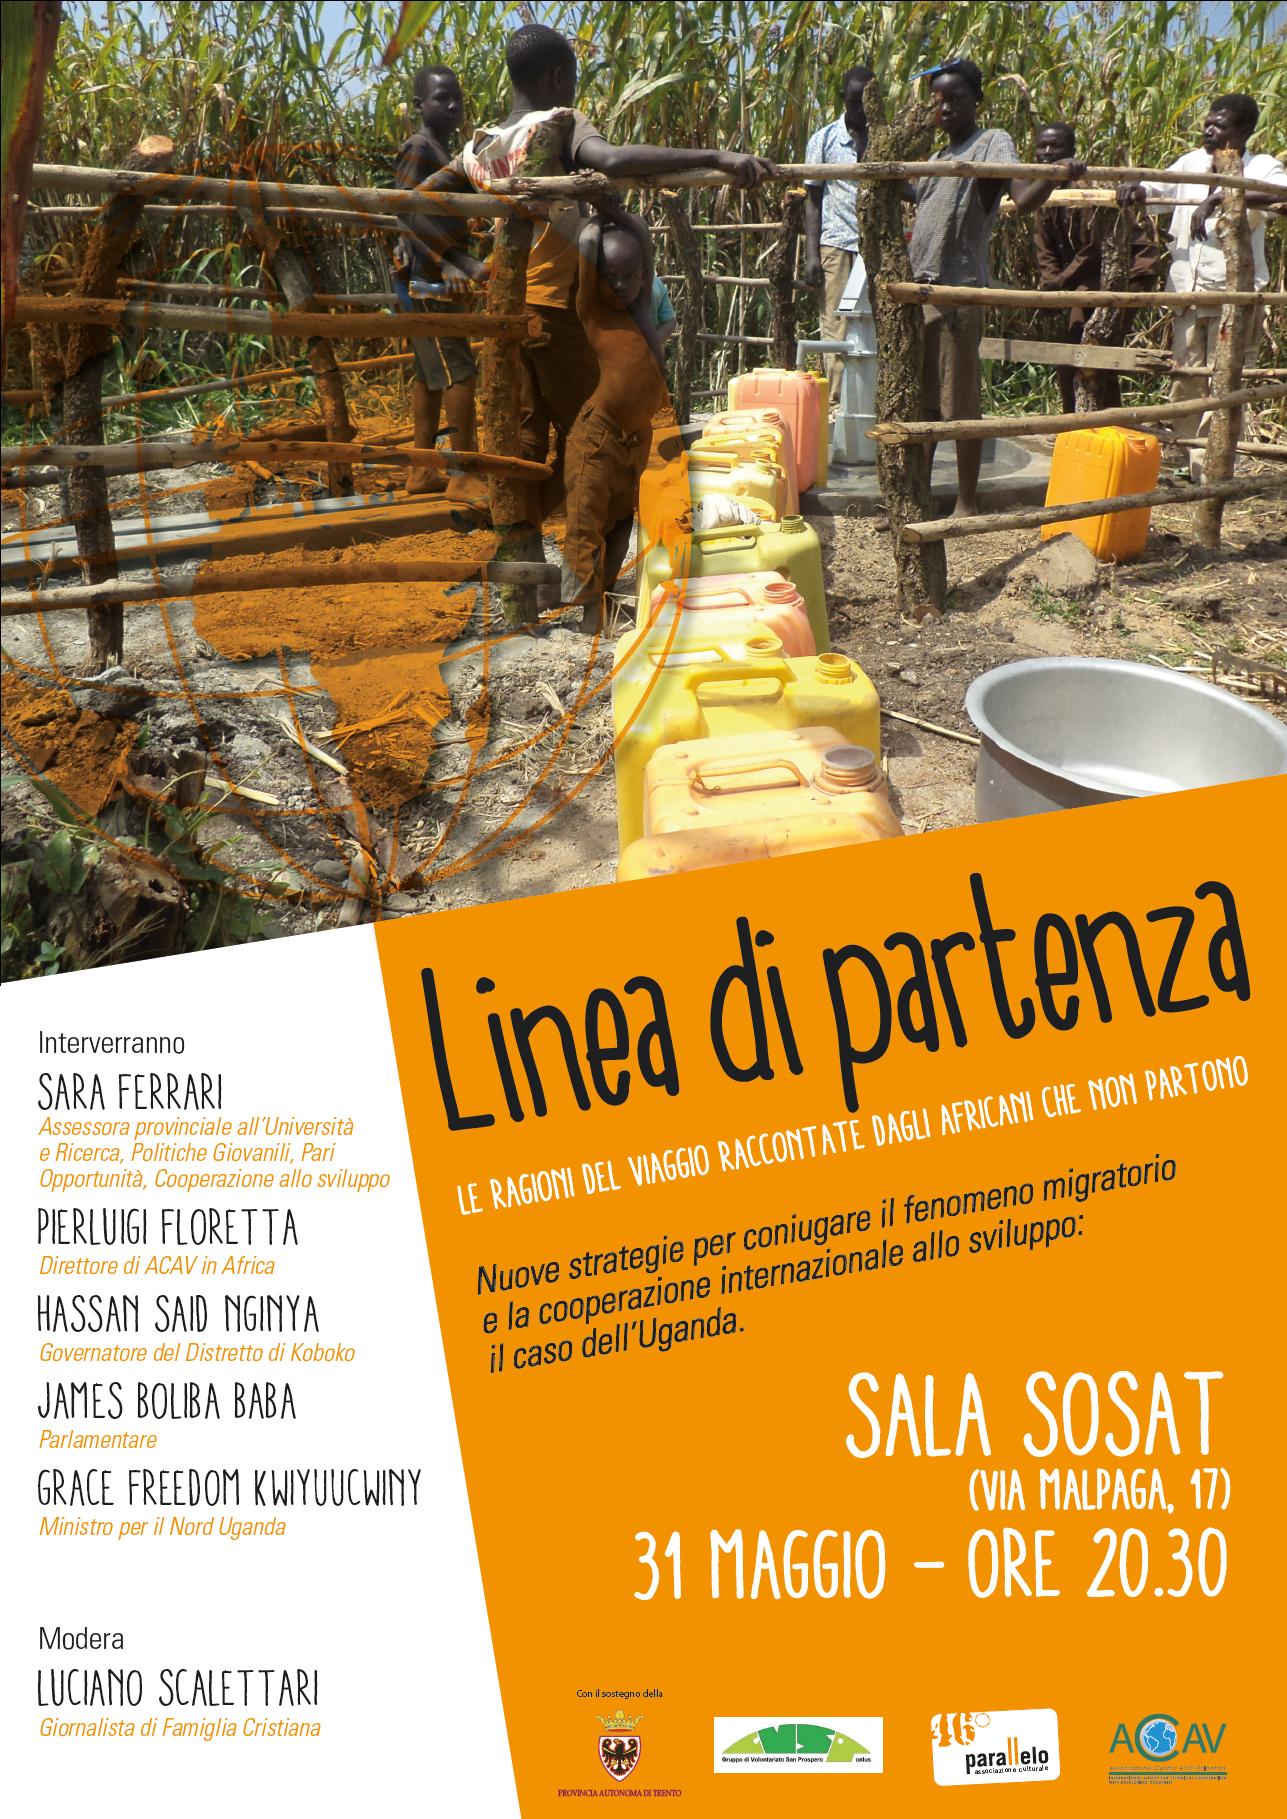 Locandina-evento-31-maggio-Sala-SOSAT